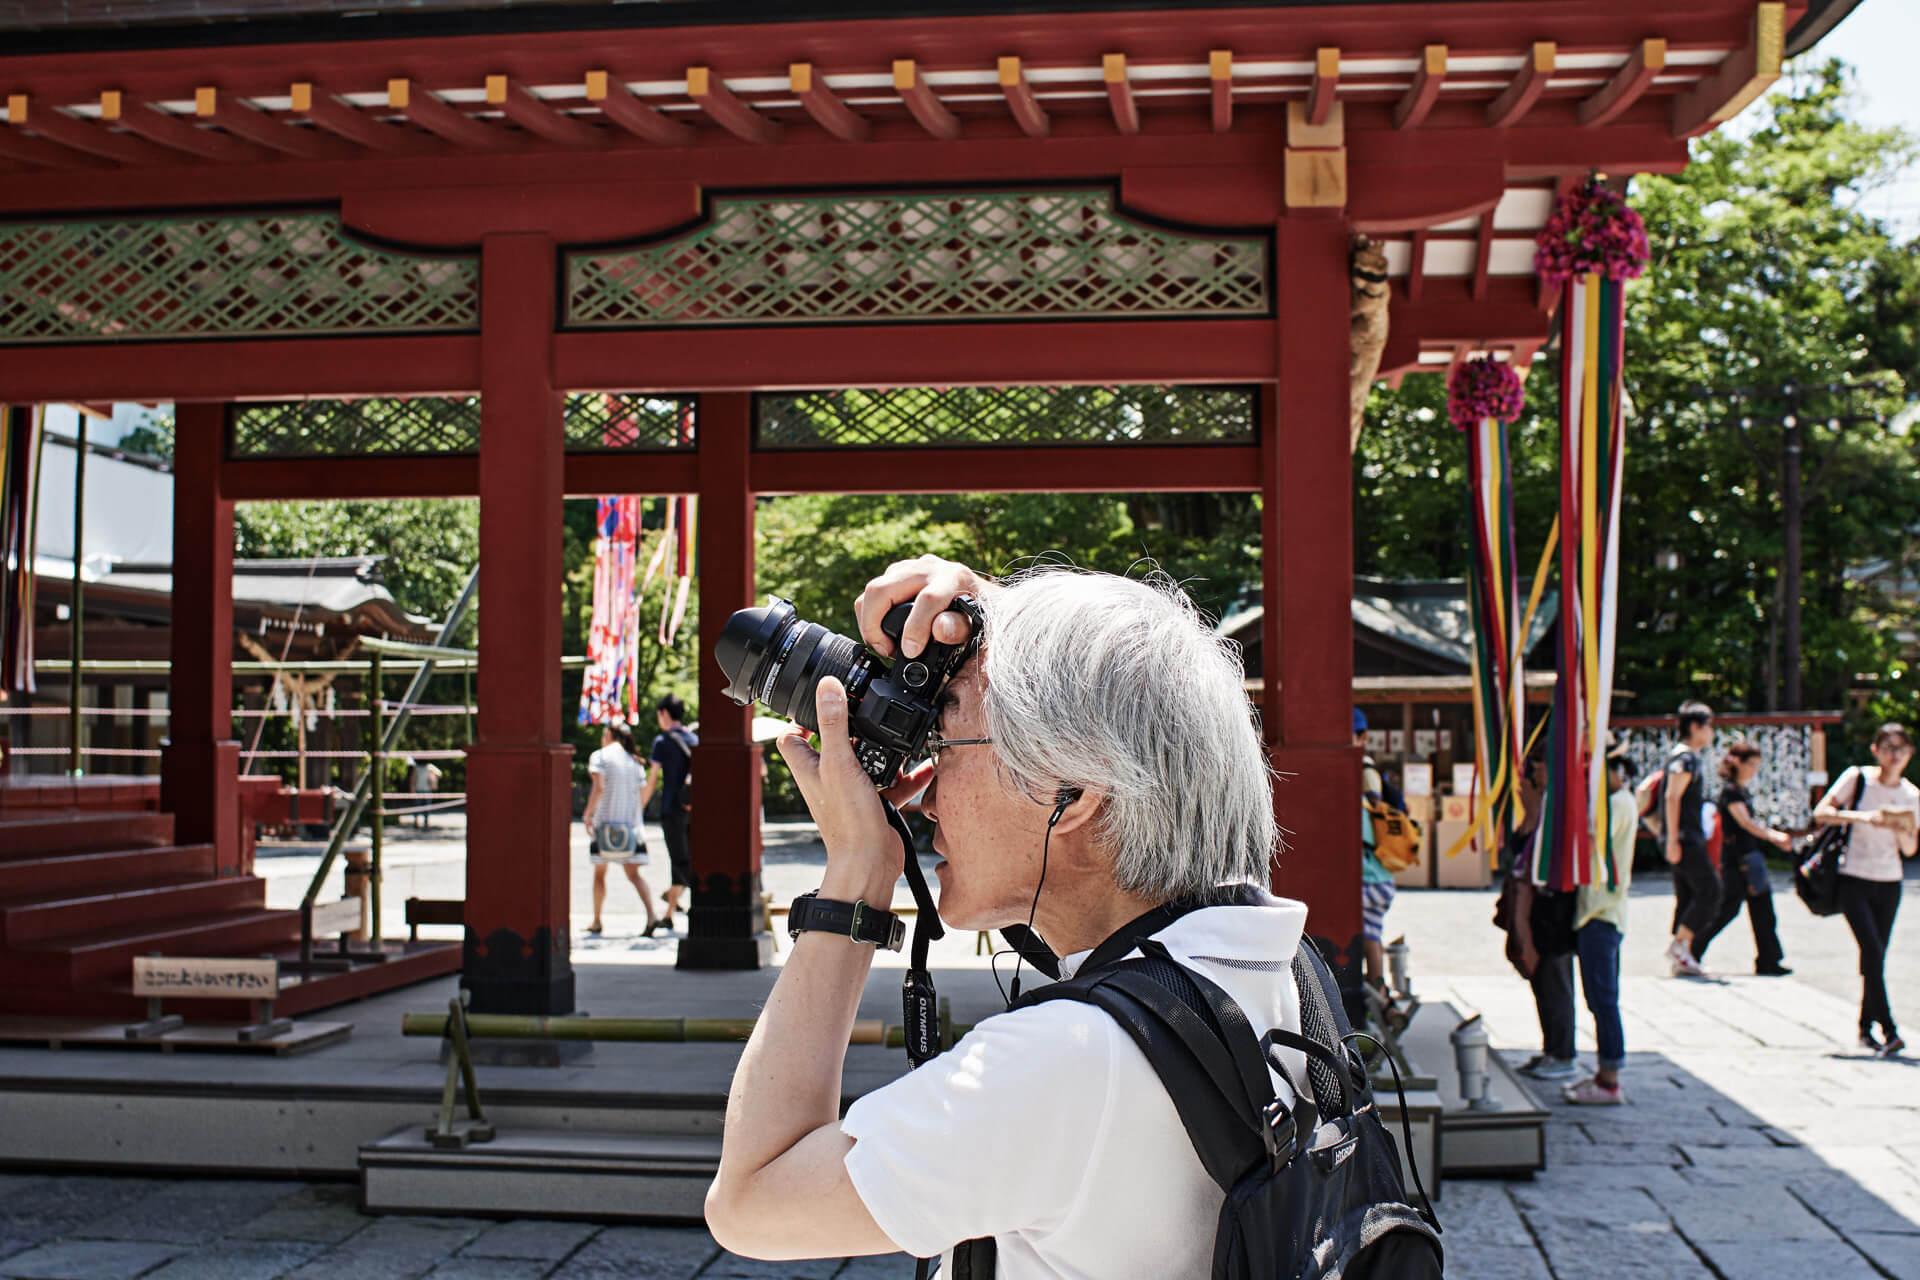 20160618_nippon_kamakura_036-Kopie